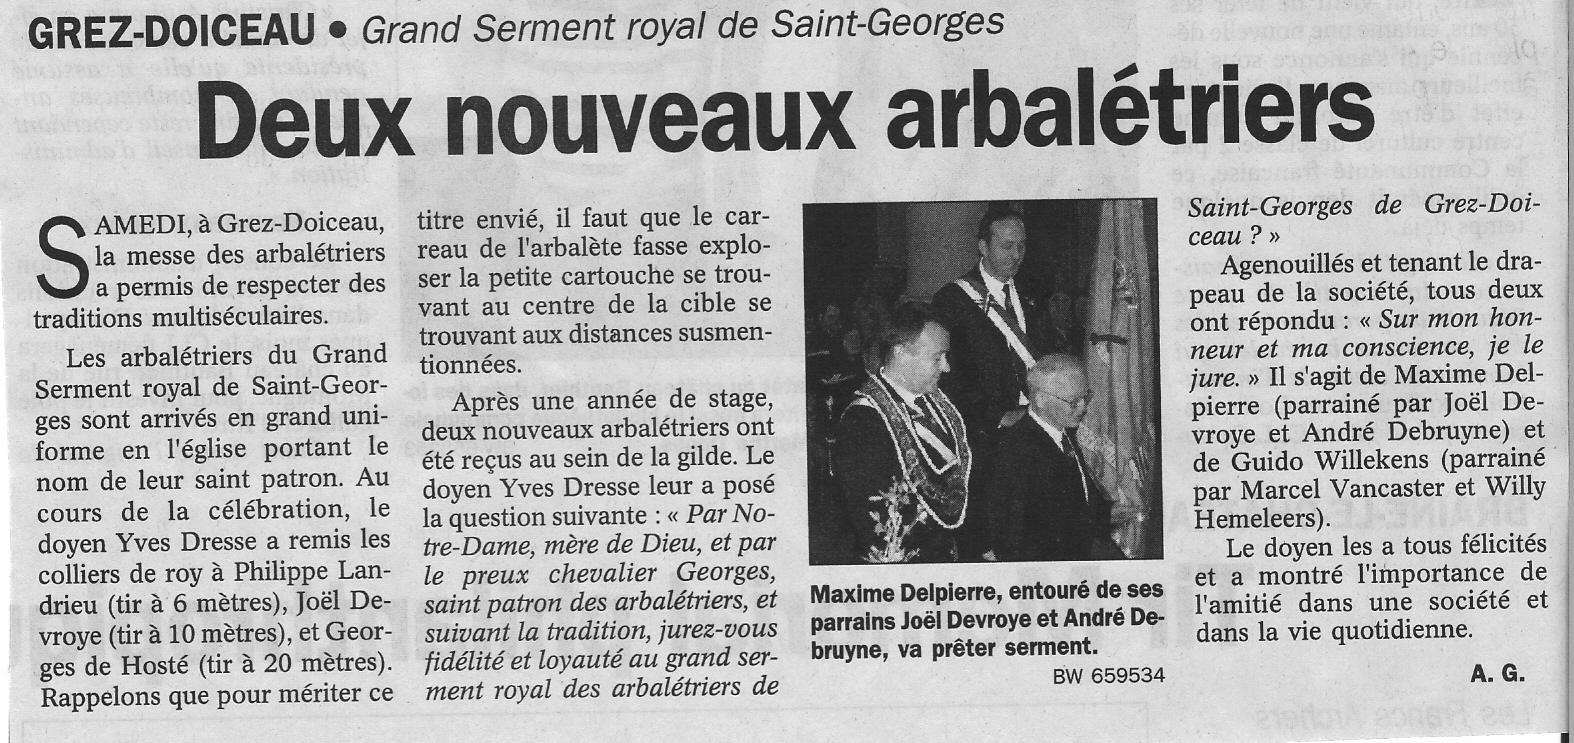 Prestation de serment-2006